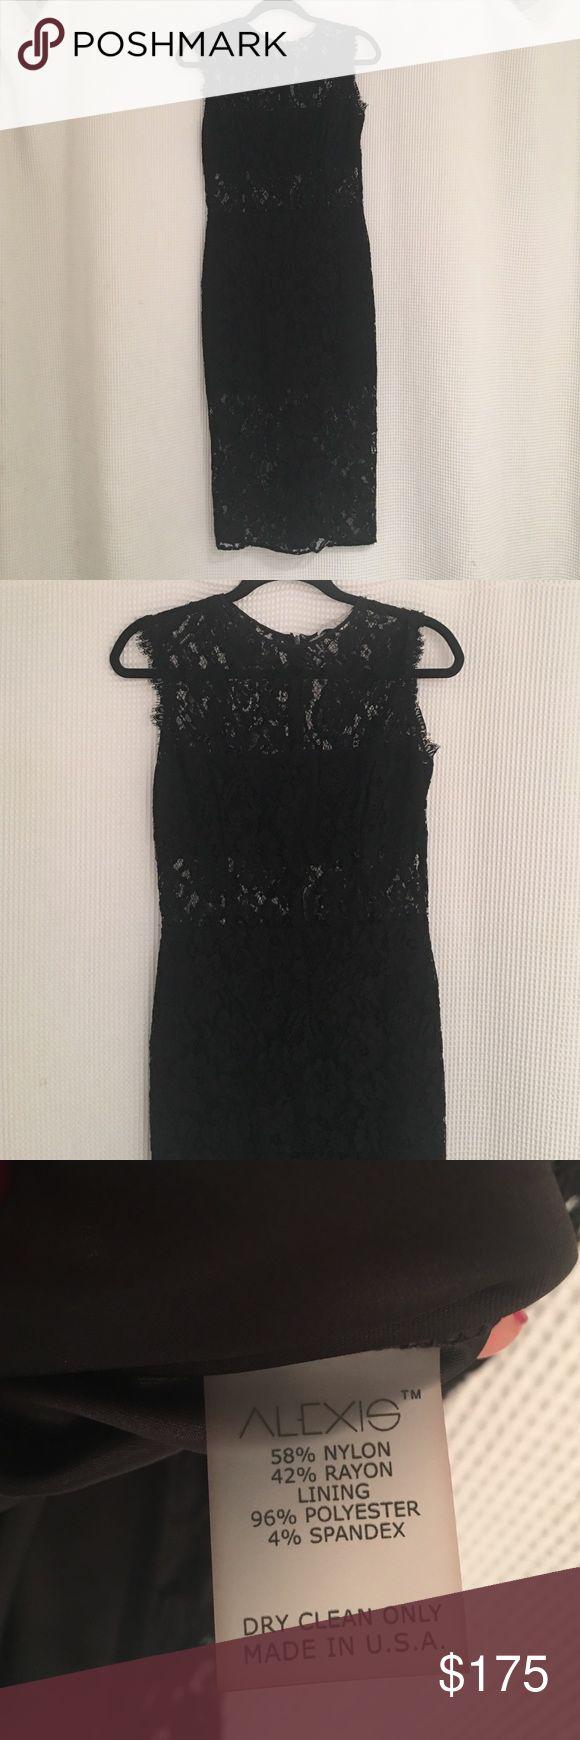 Alexis black lace pencil dress size medium Alexis black lace dress sleeveless size medium worn once. Gorgeous and flattering. alexis Dresses Midi